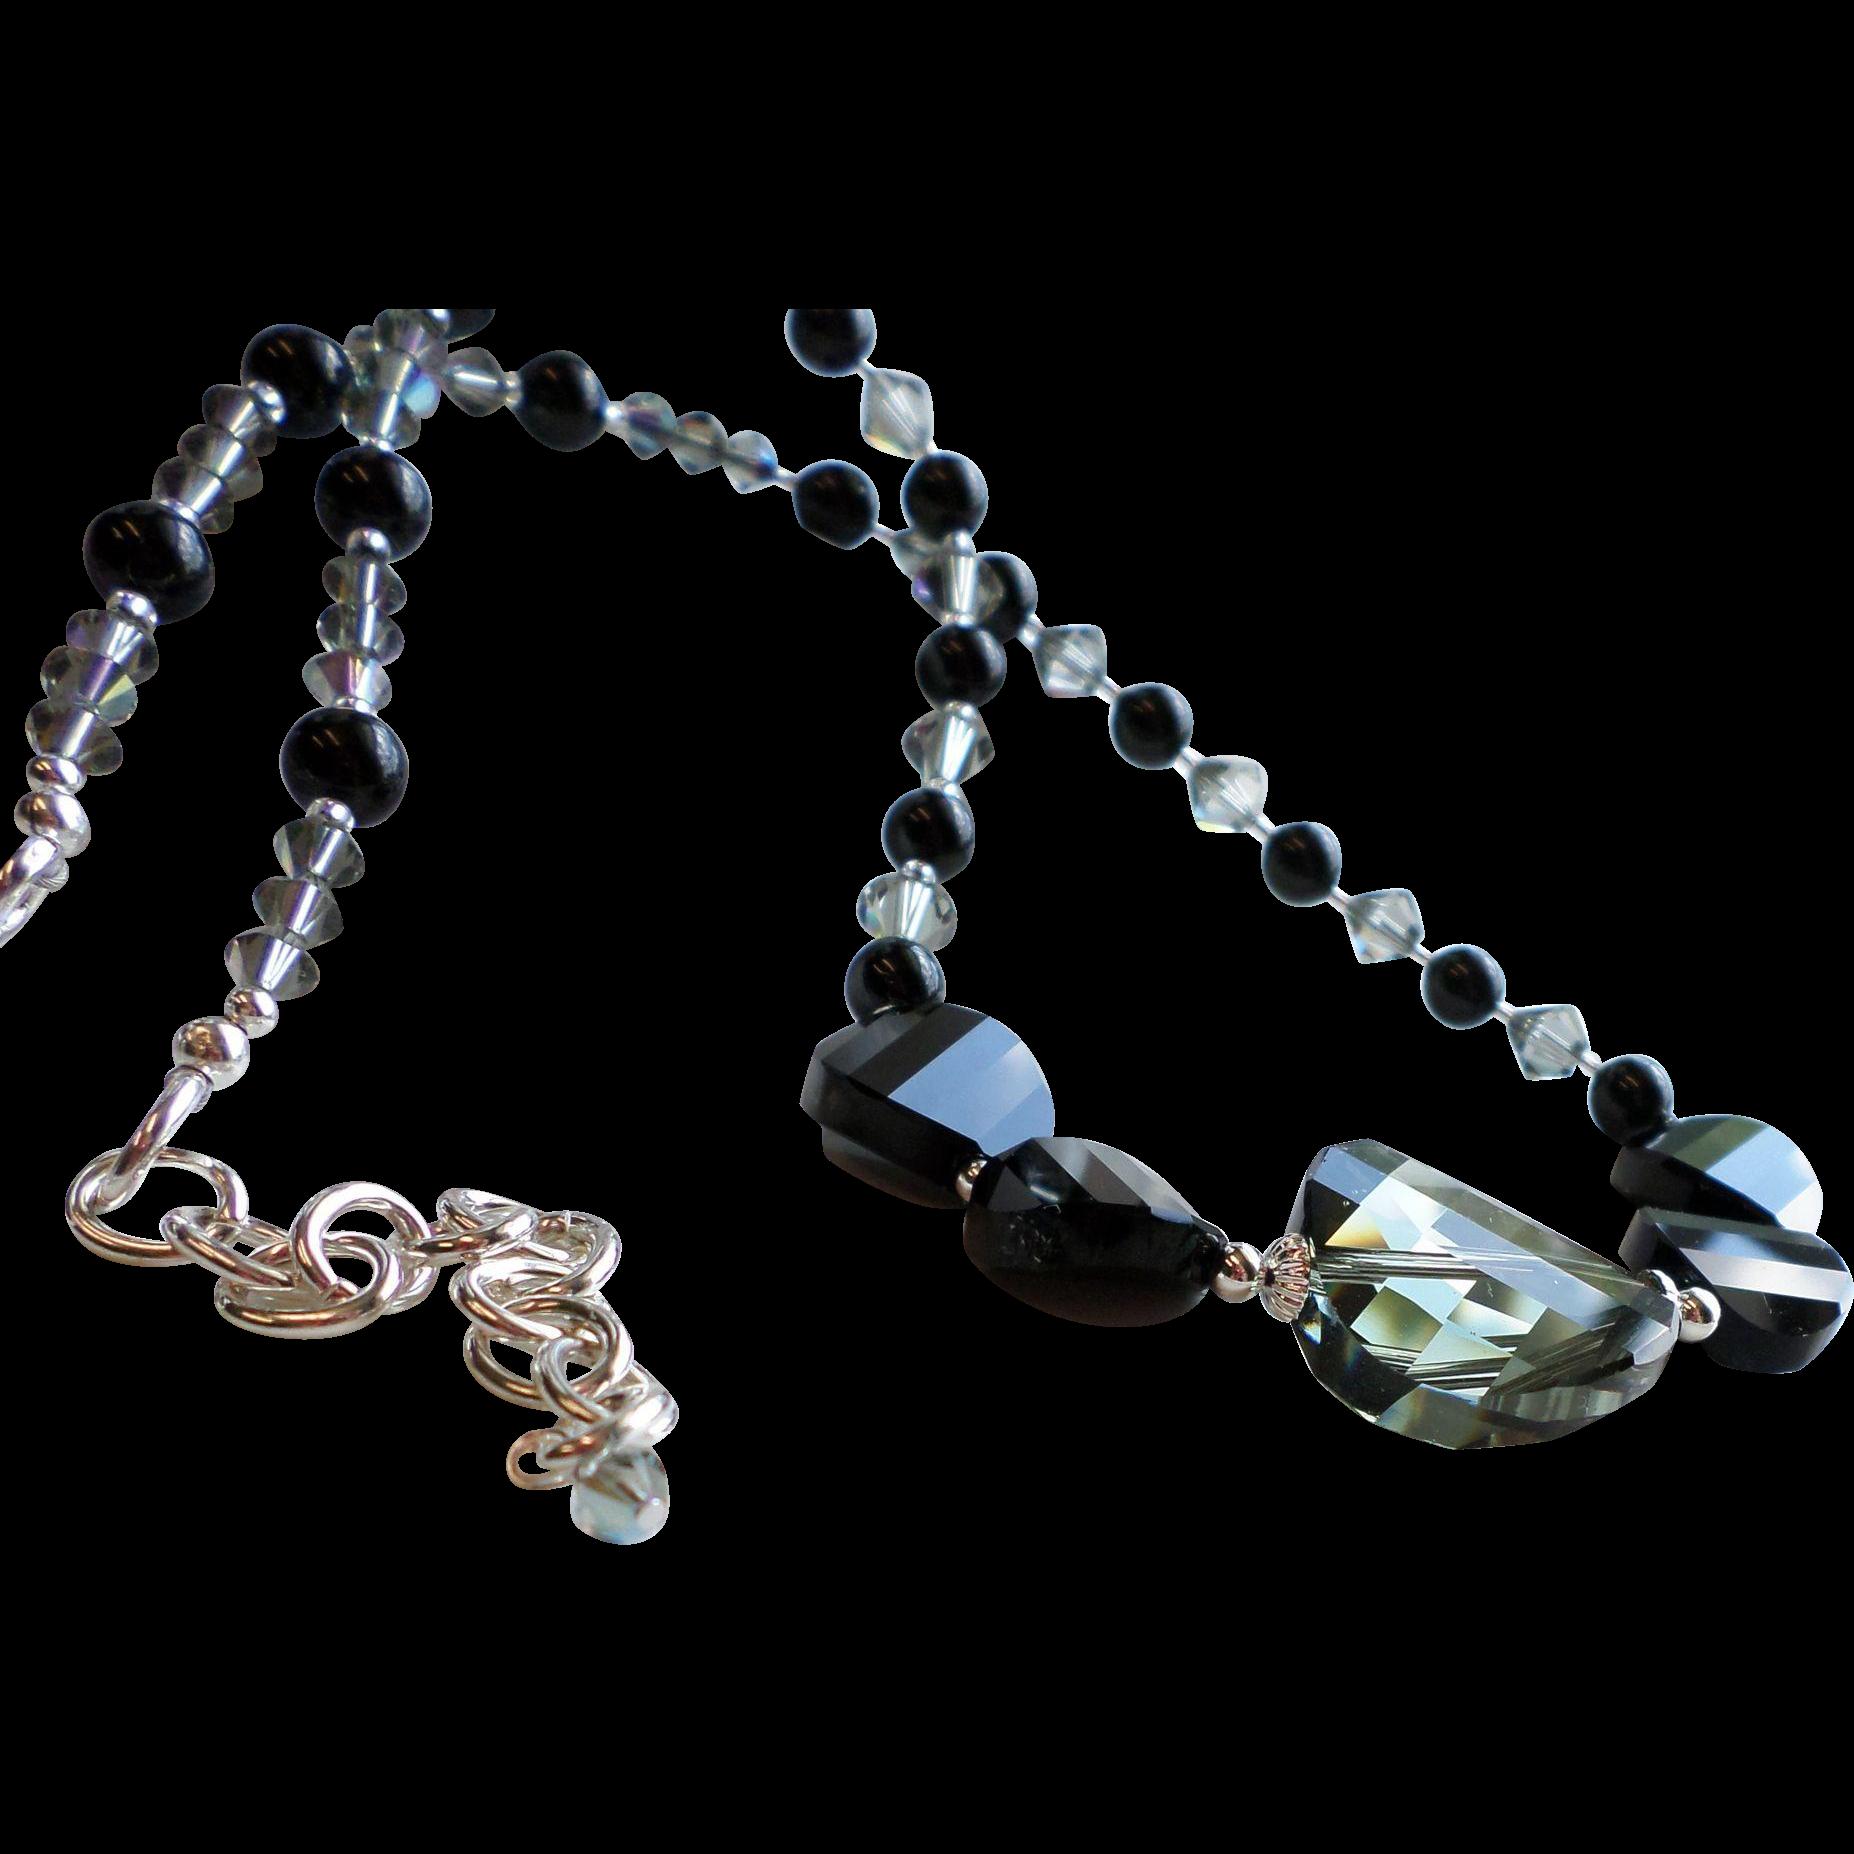 Black Diamond and Jet Black Swarovski Crystal Statement Necklace